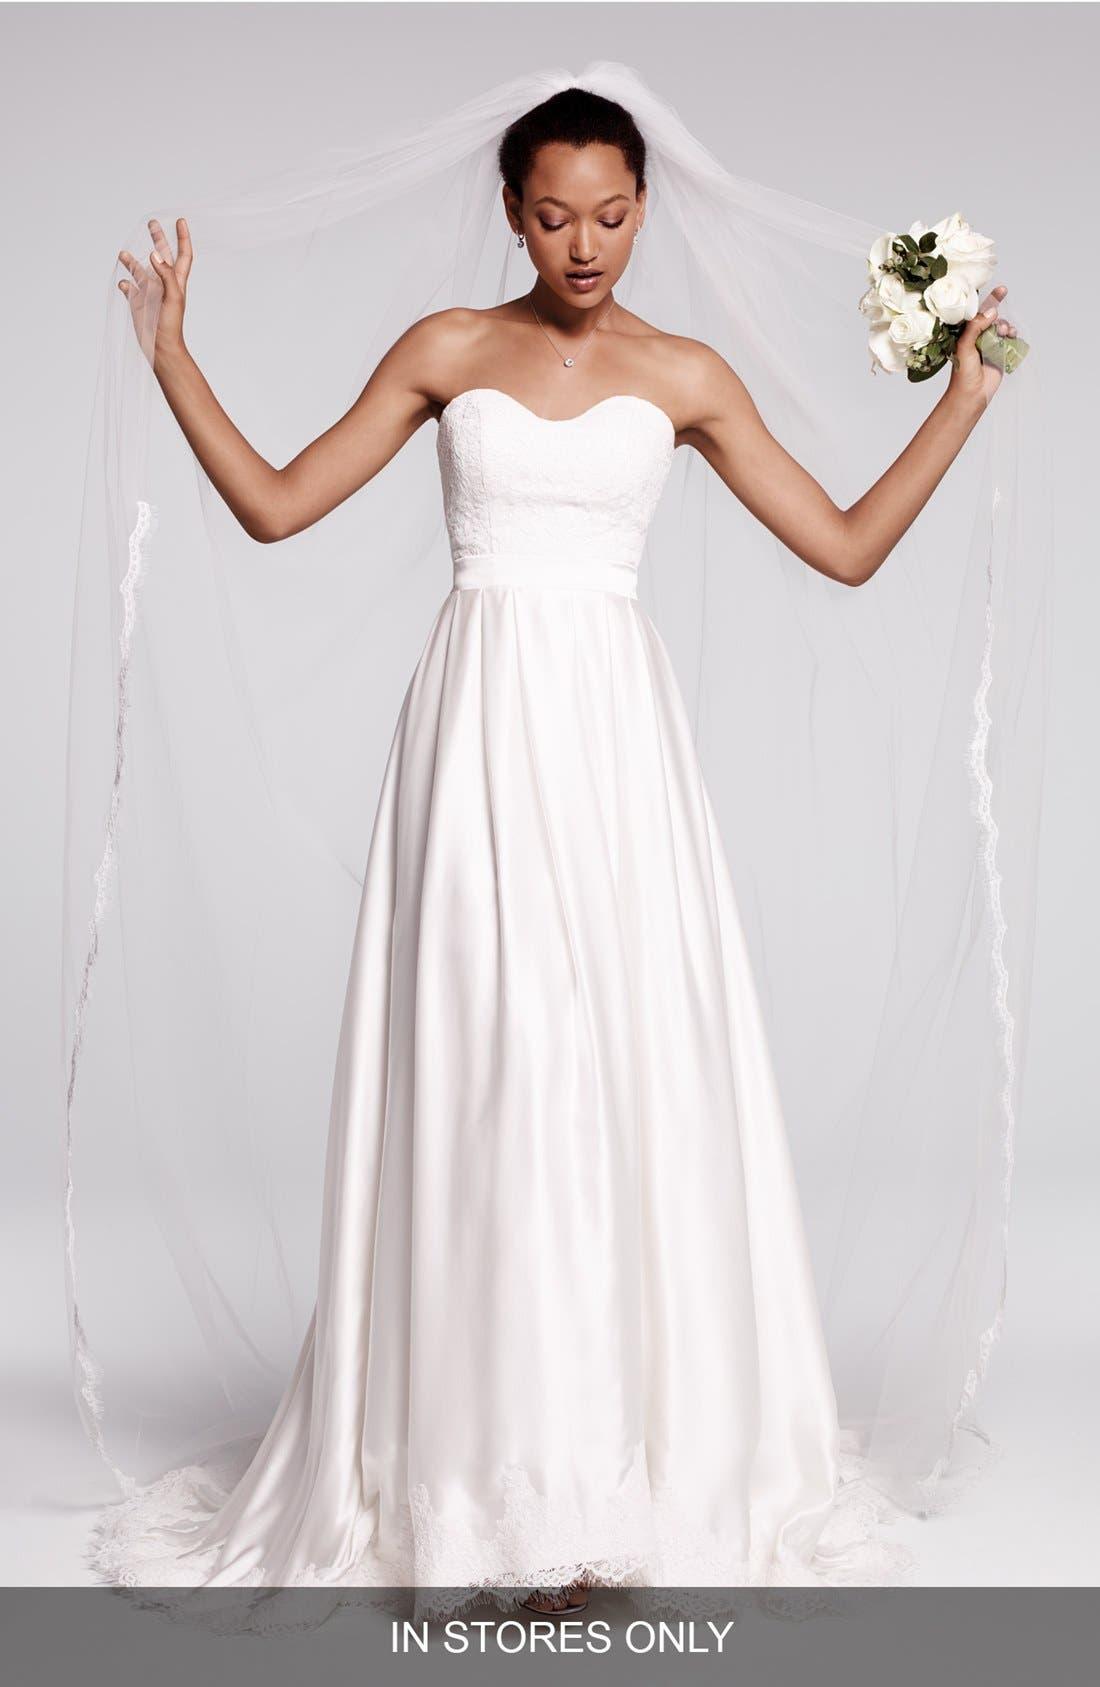 Main Image - Olia Zavozina 'Ebie' Lace & Silk Charmeuse Dress (In Stores Only)